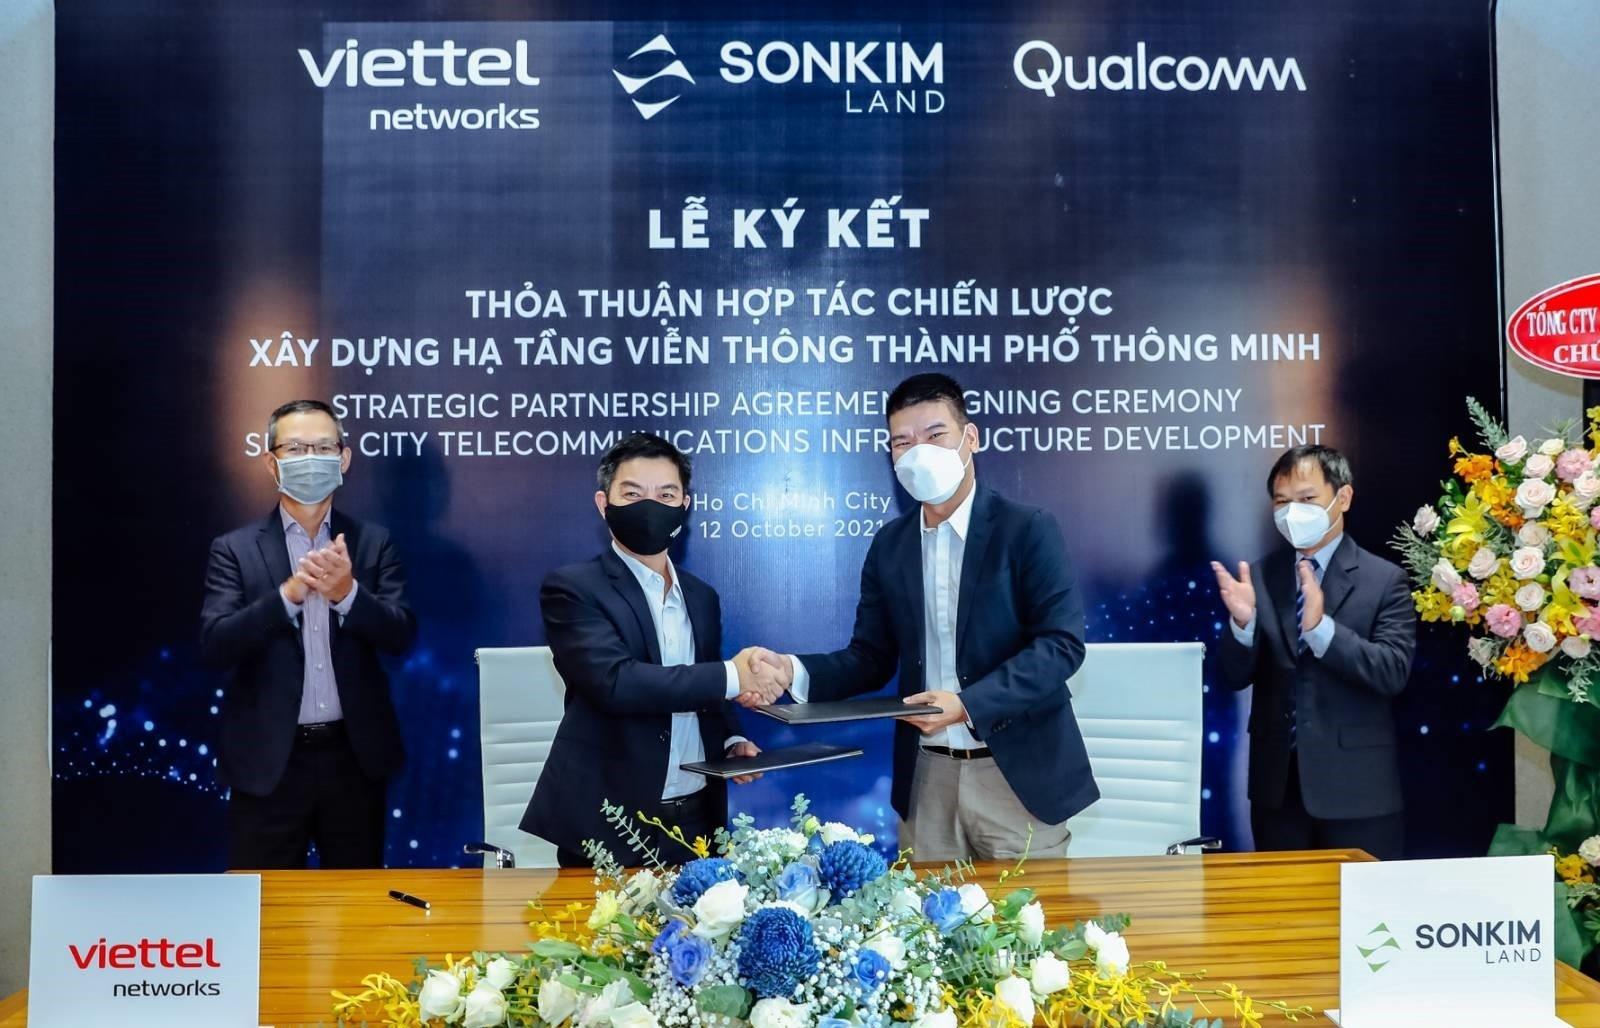 SonKim Land's pioneering journey to build The 9 Stellars Smart Township platform